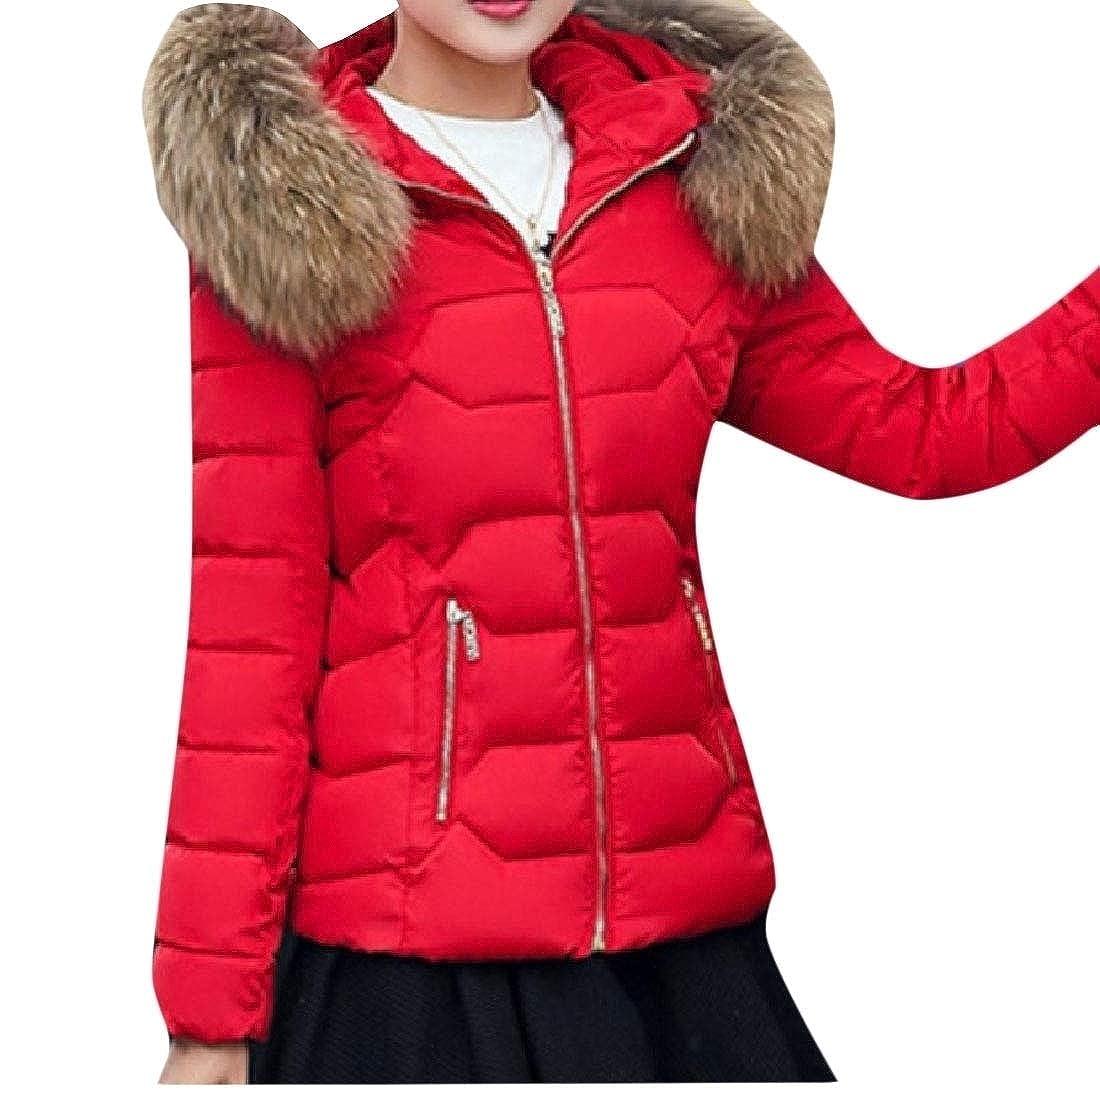 YUNY Womens Faux-Fur Trim Outwear Hooded Warm Cotton Wadded Jacket Six 2XL